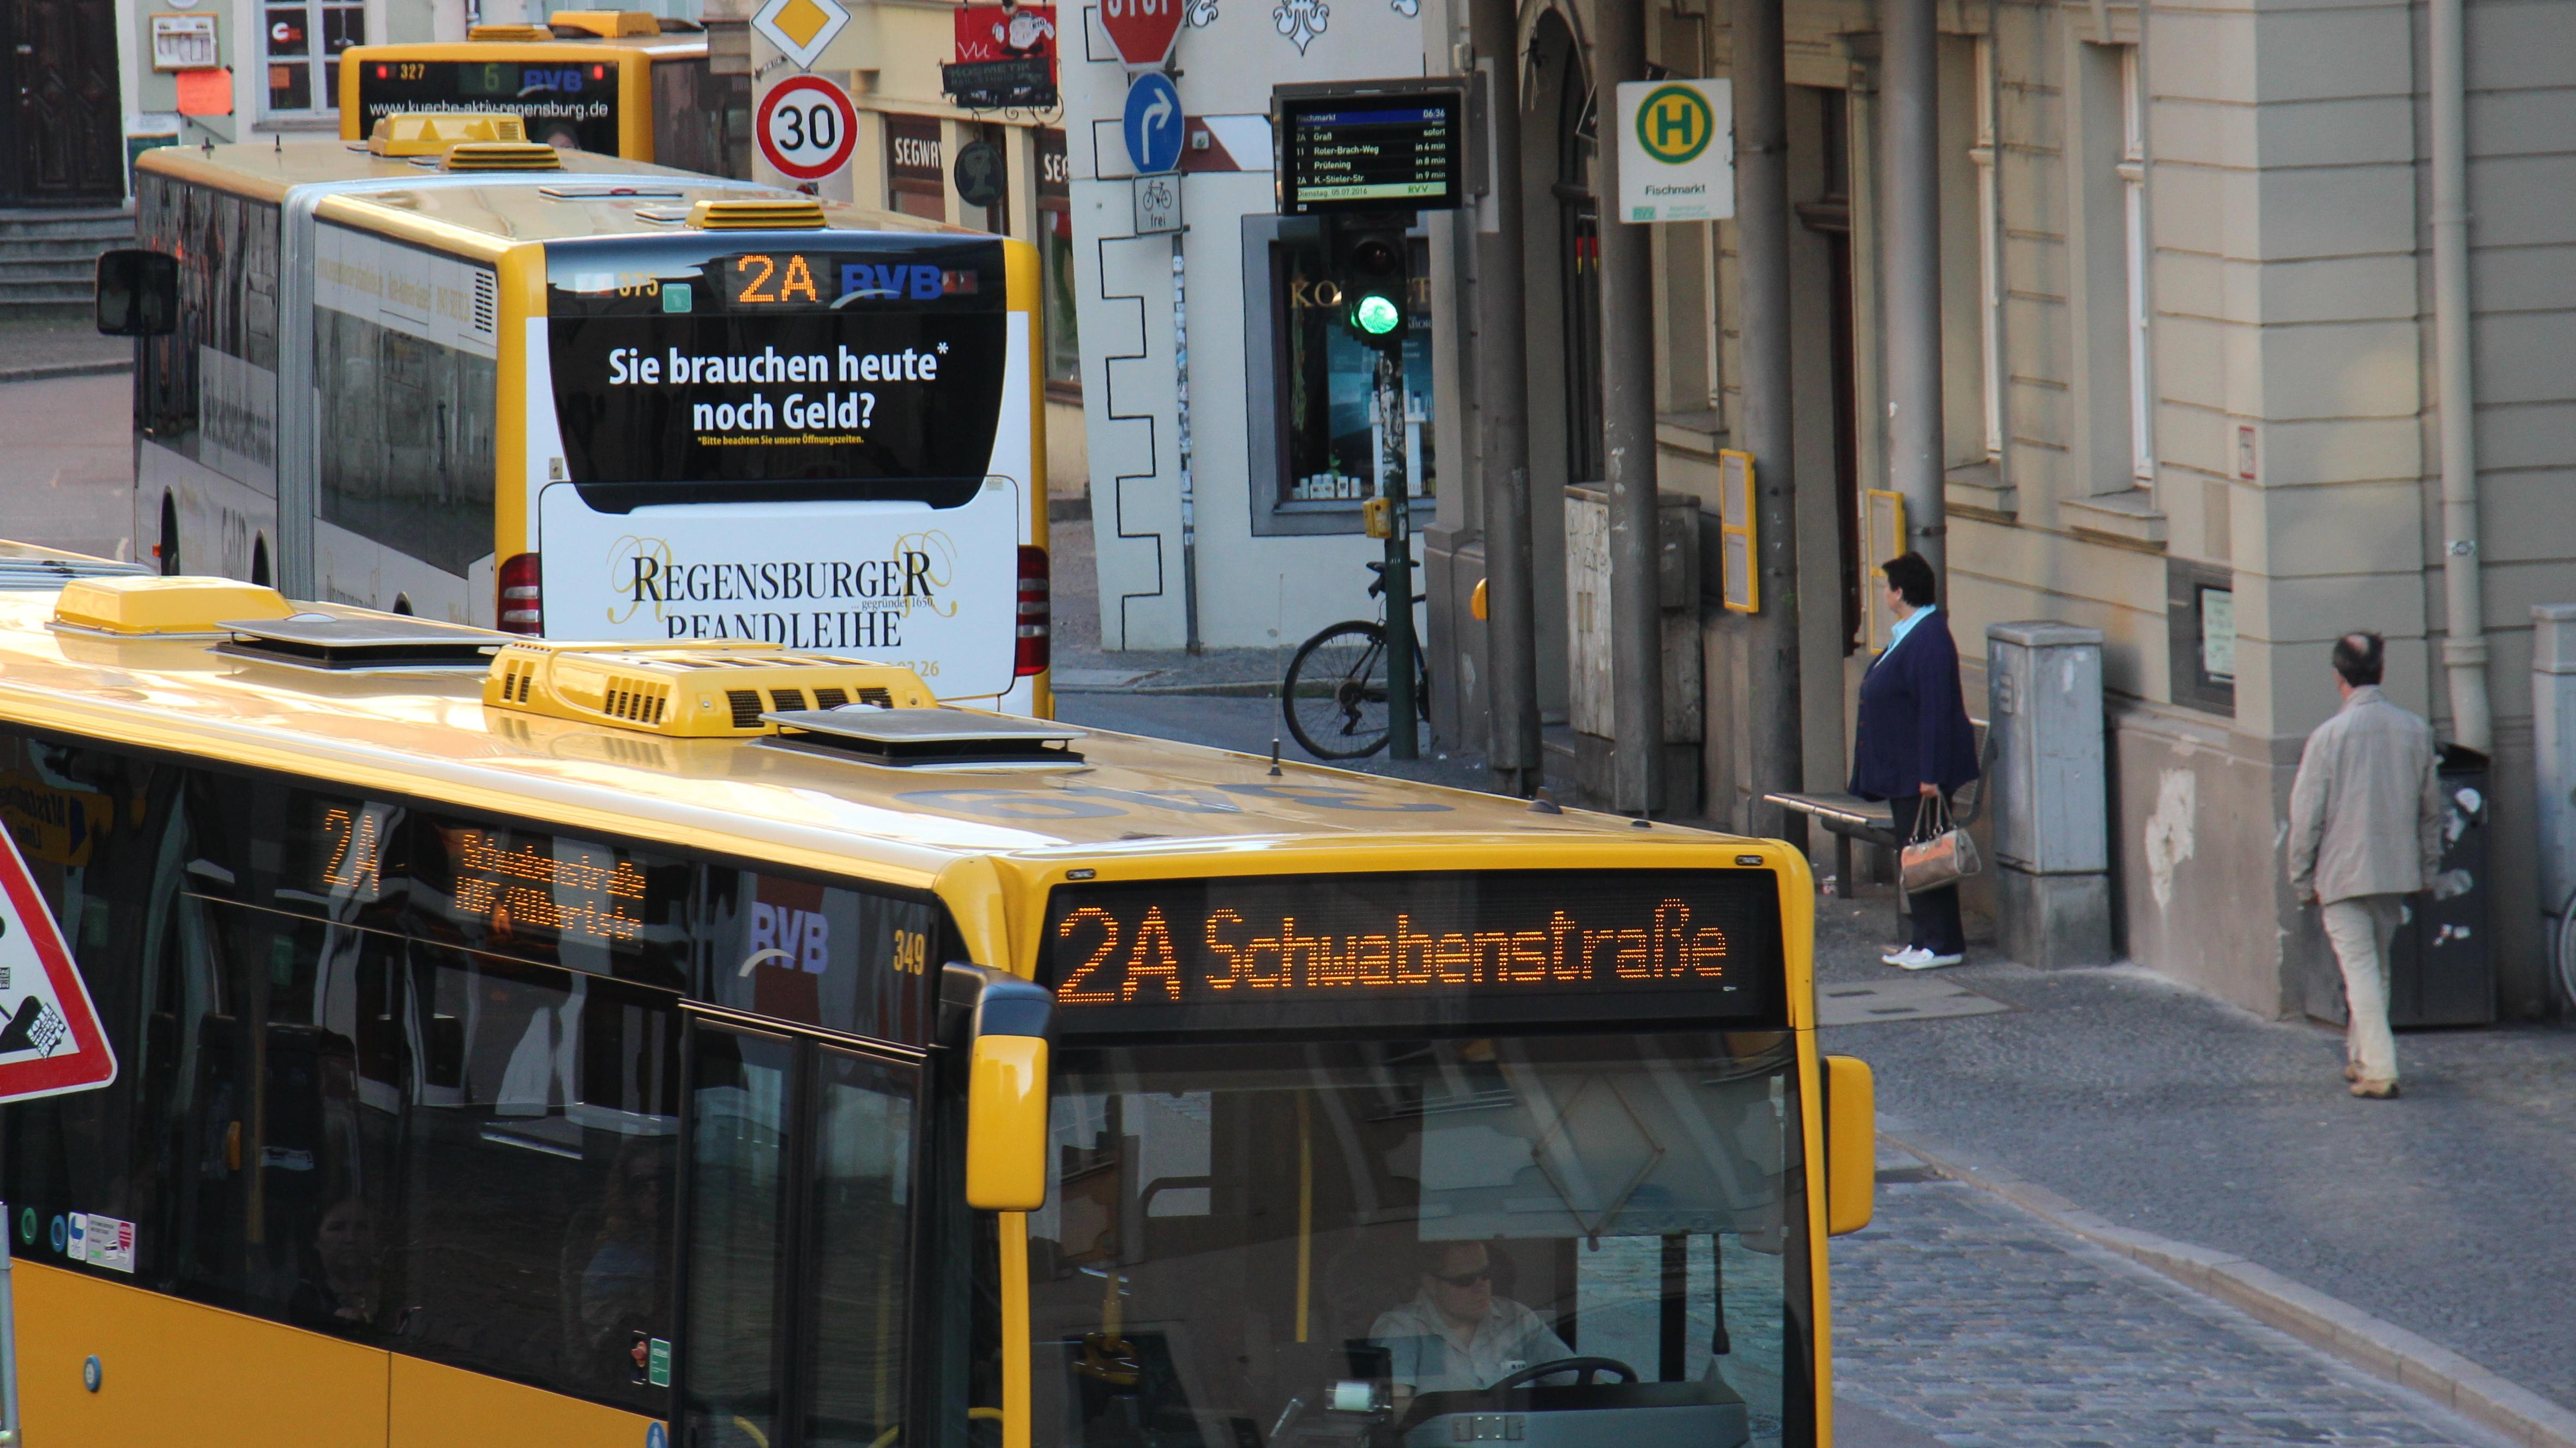 usse in der Regensburger Altstadt (Keplerstraße - Goldene-Bären-Straße)